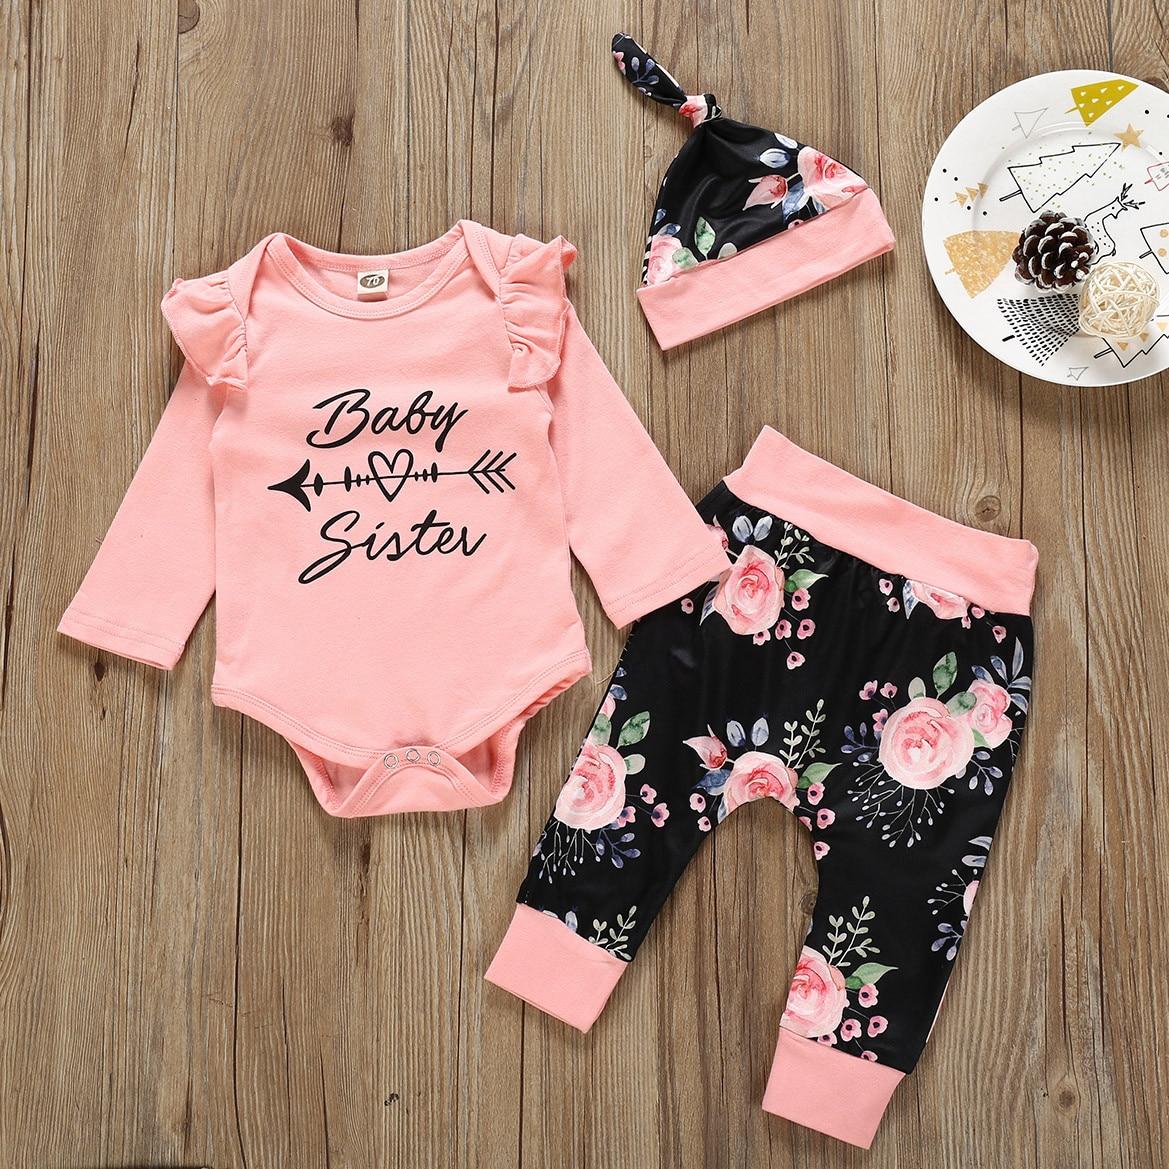 Newborn Baby Girl Clothes Infant Baby Girl Sets Letter Romper+Flower Pants+Cap Newborn Baby Girl Outfits Ensemble Bebe Fille